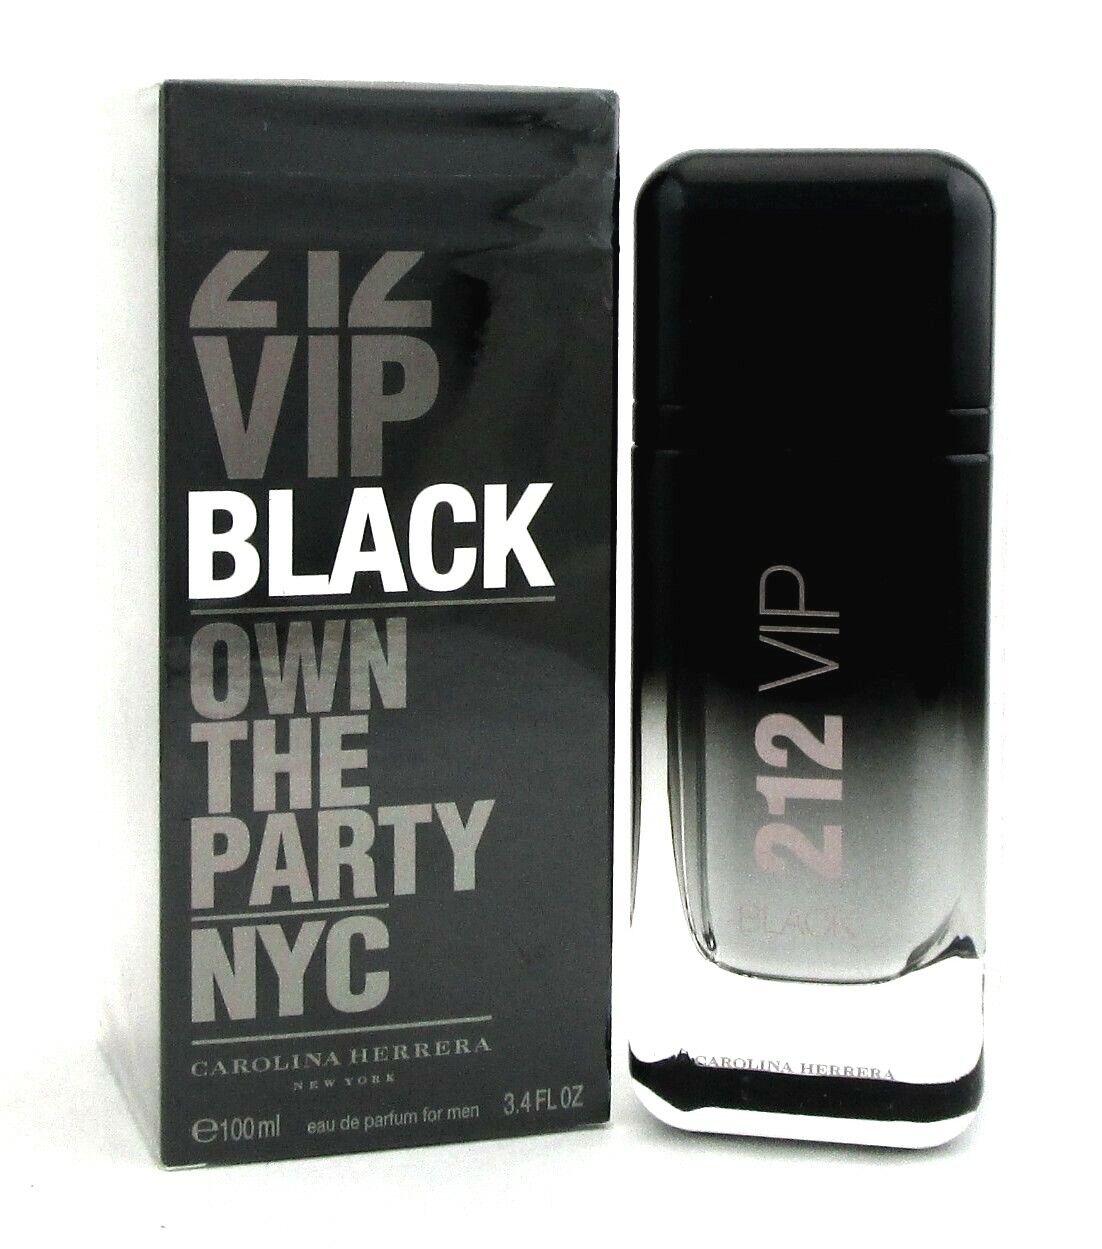 4oz De Parfum 100ml Black For 3 Spray Carolina Herrera 212 Vip Eau Men ymN8nv0wOP